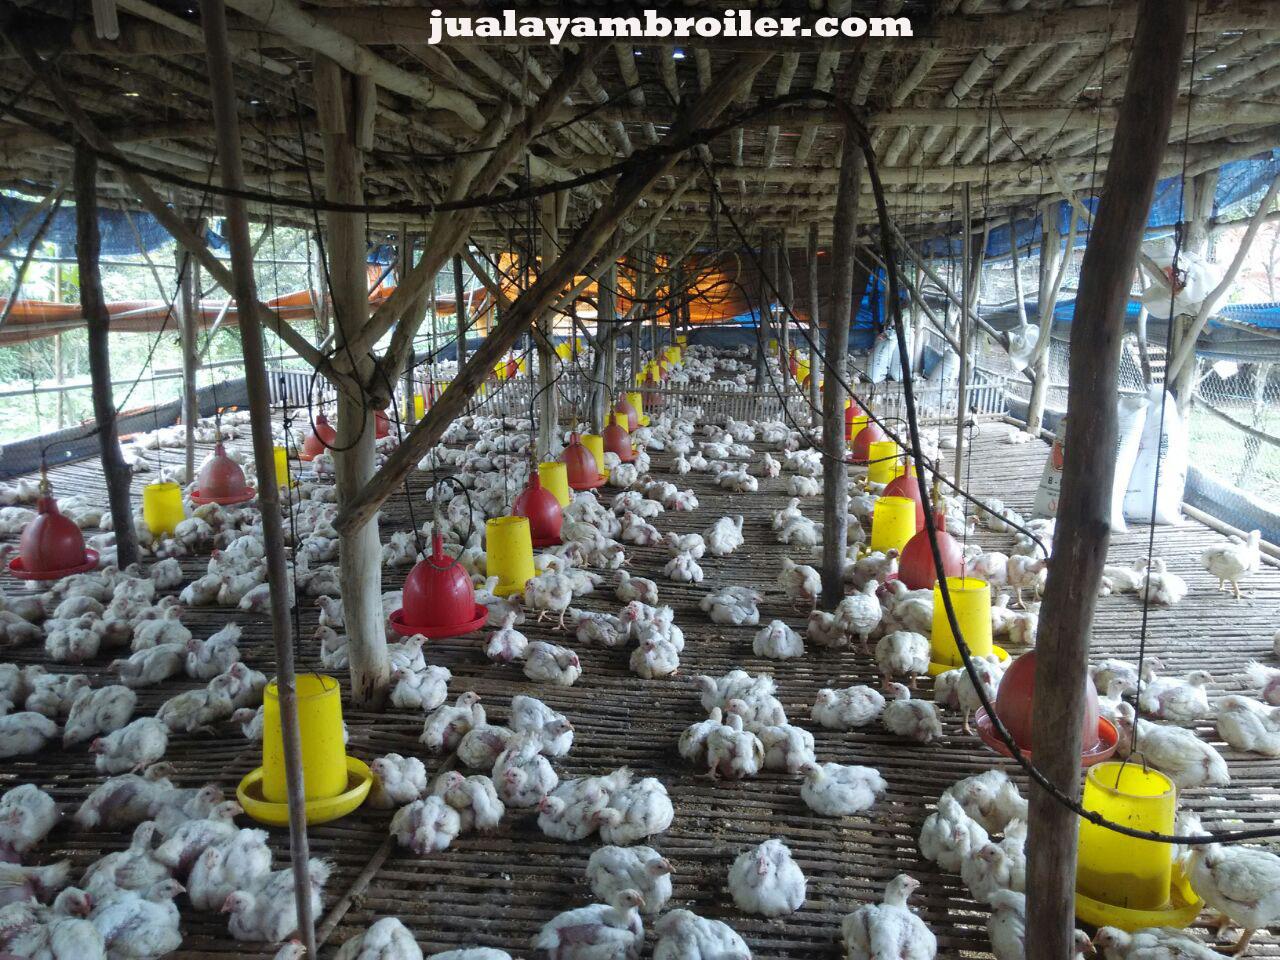 Jual Ayam Broiler Pekayon Jaya